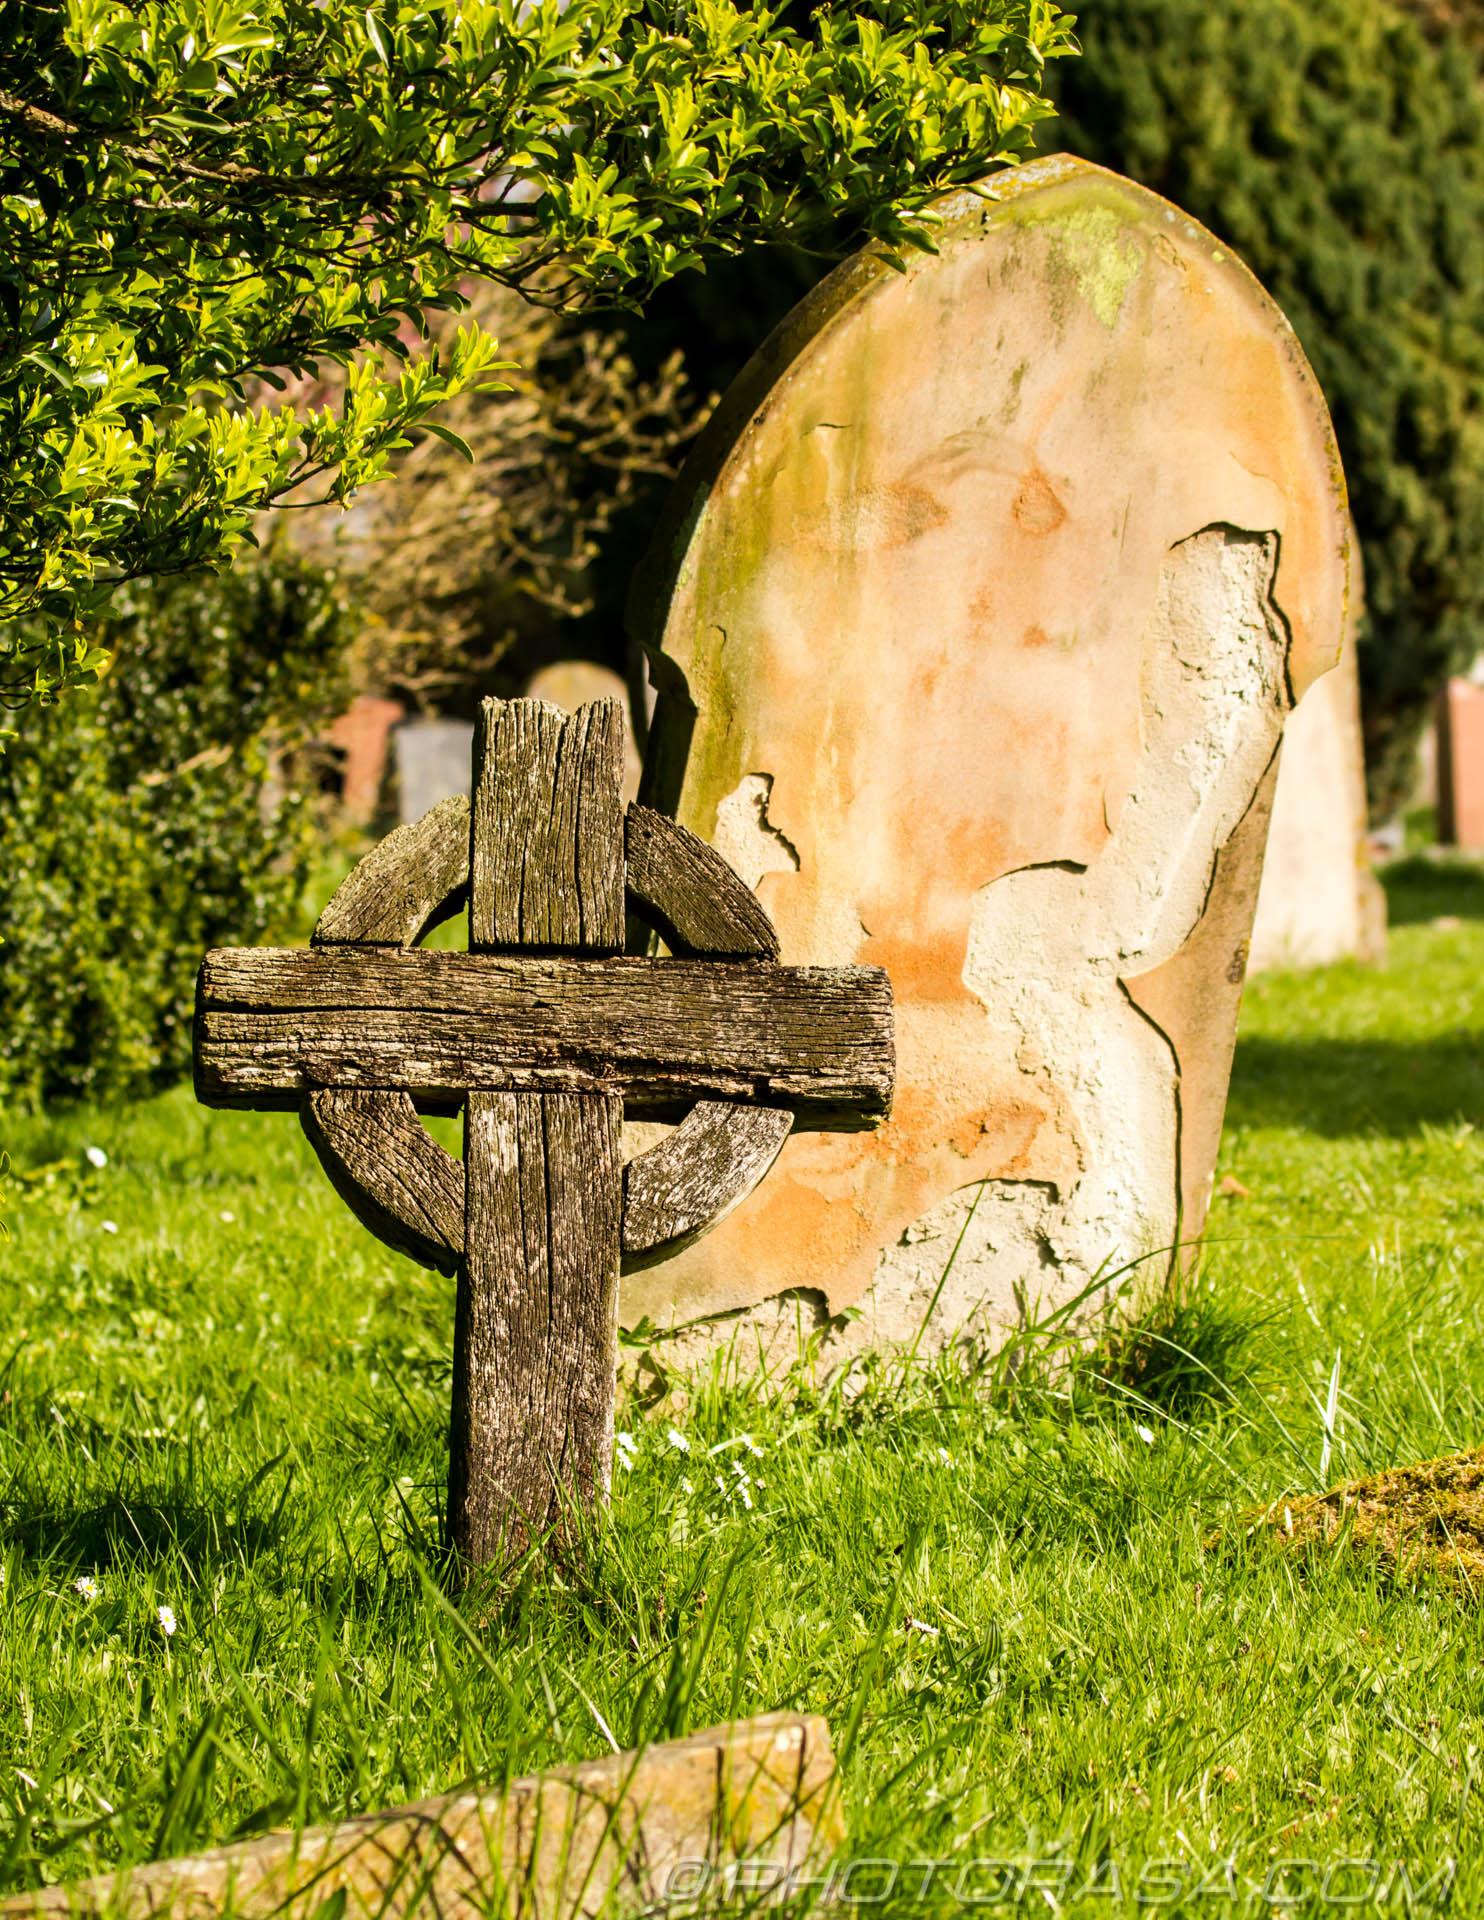 https://photorasa.com/saints-church-staplehurst-kent/old-wooden-celtic-cross-and-stone-grave/